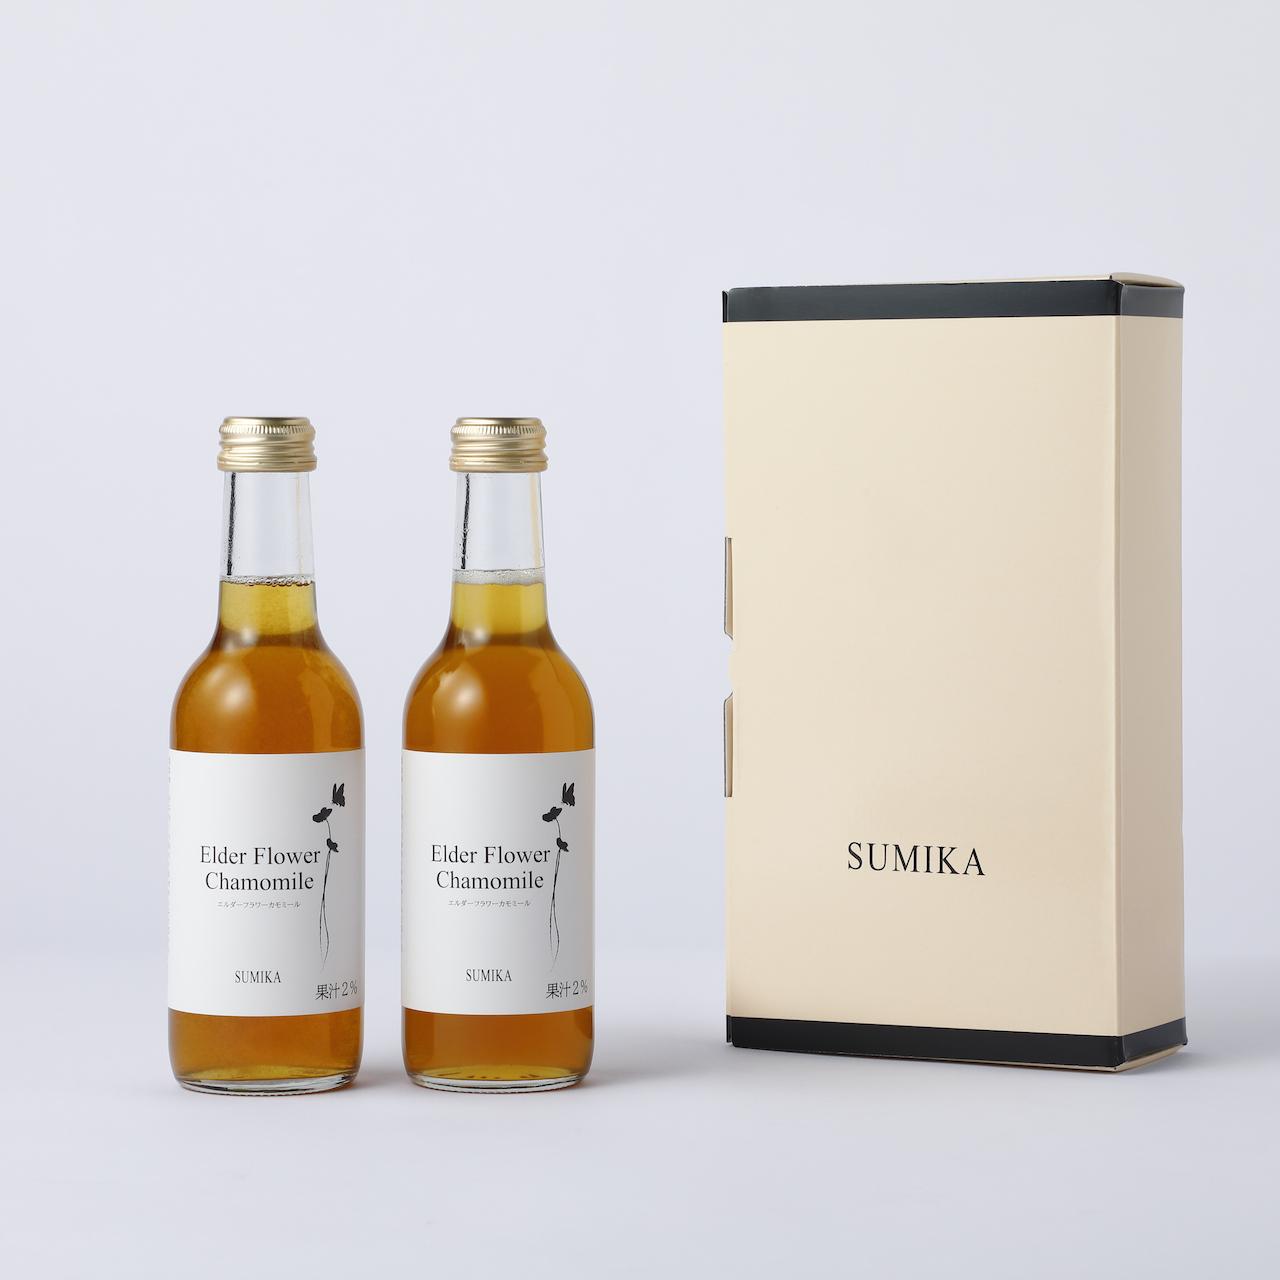 """【GIFT BOX】Elderflower Chamomile syrup(245ml×2)/ エルダーフラワーカモミールシロップ ギフトボックス """